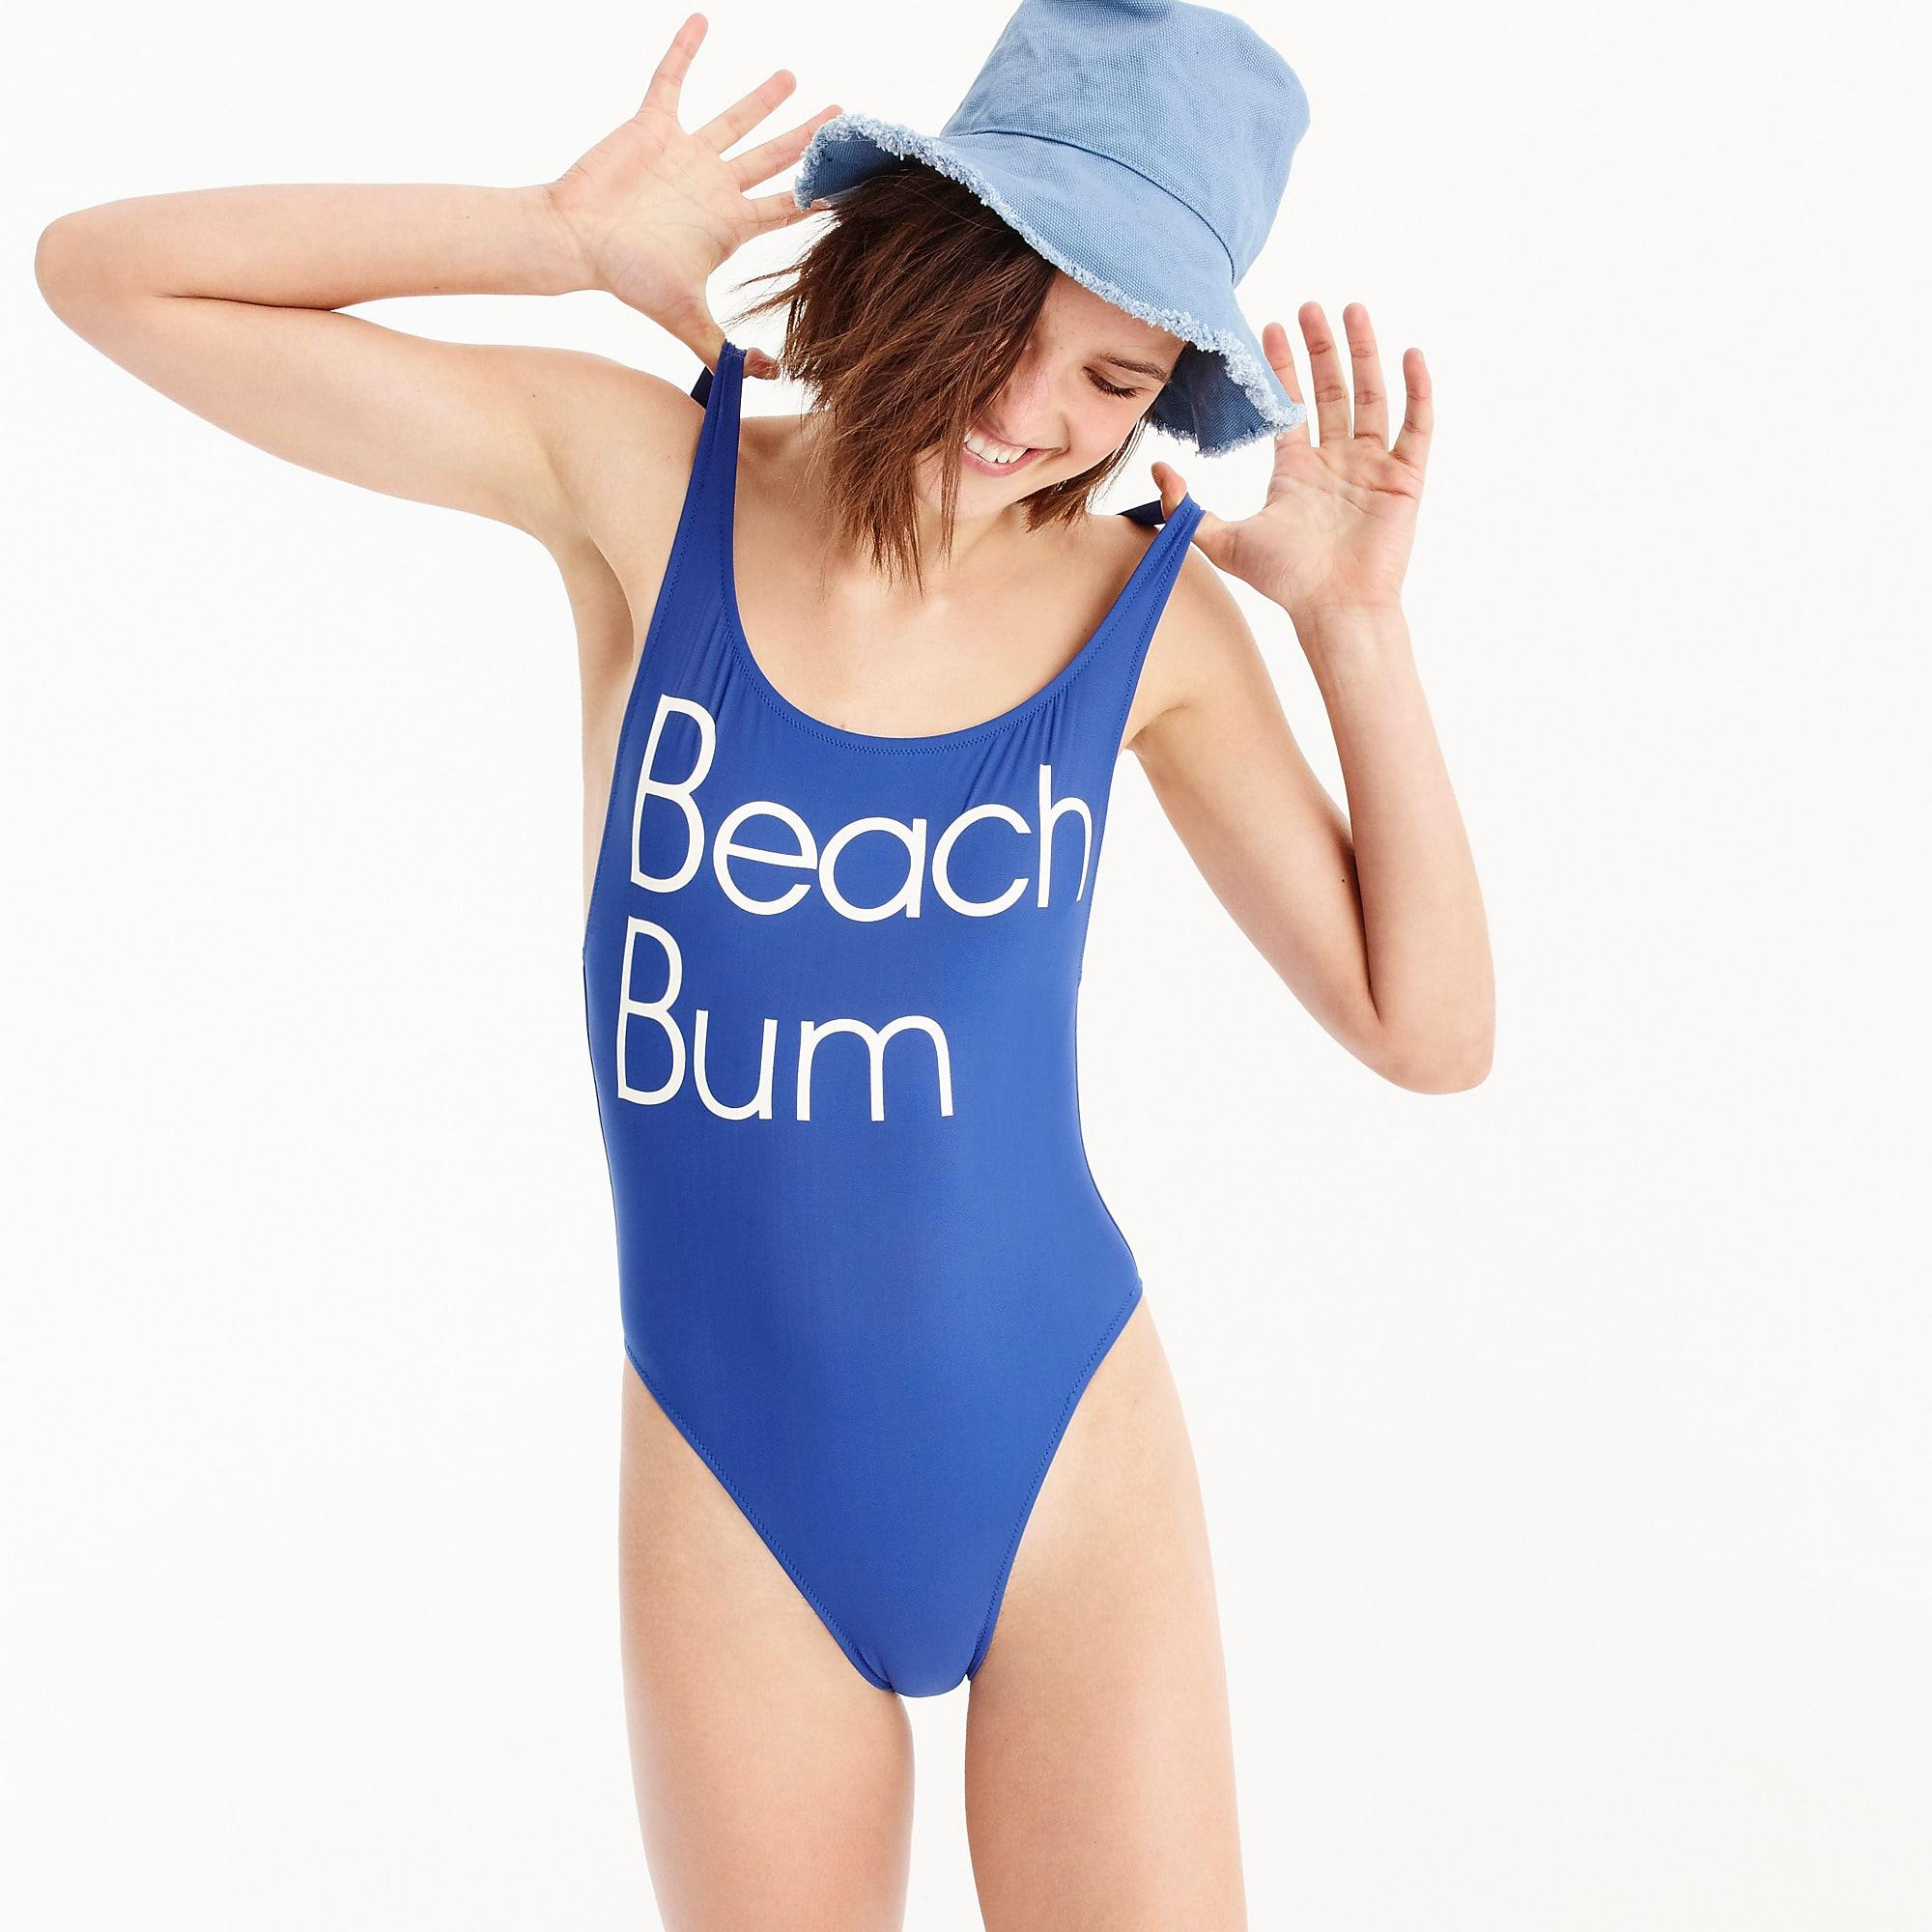 ee7c1b3dcf J.Crew Beach Bum Plunging Scoop Back One-piece Swimsuit in Blue - Lyst